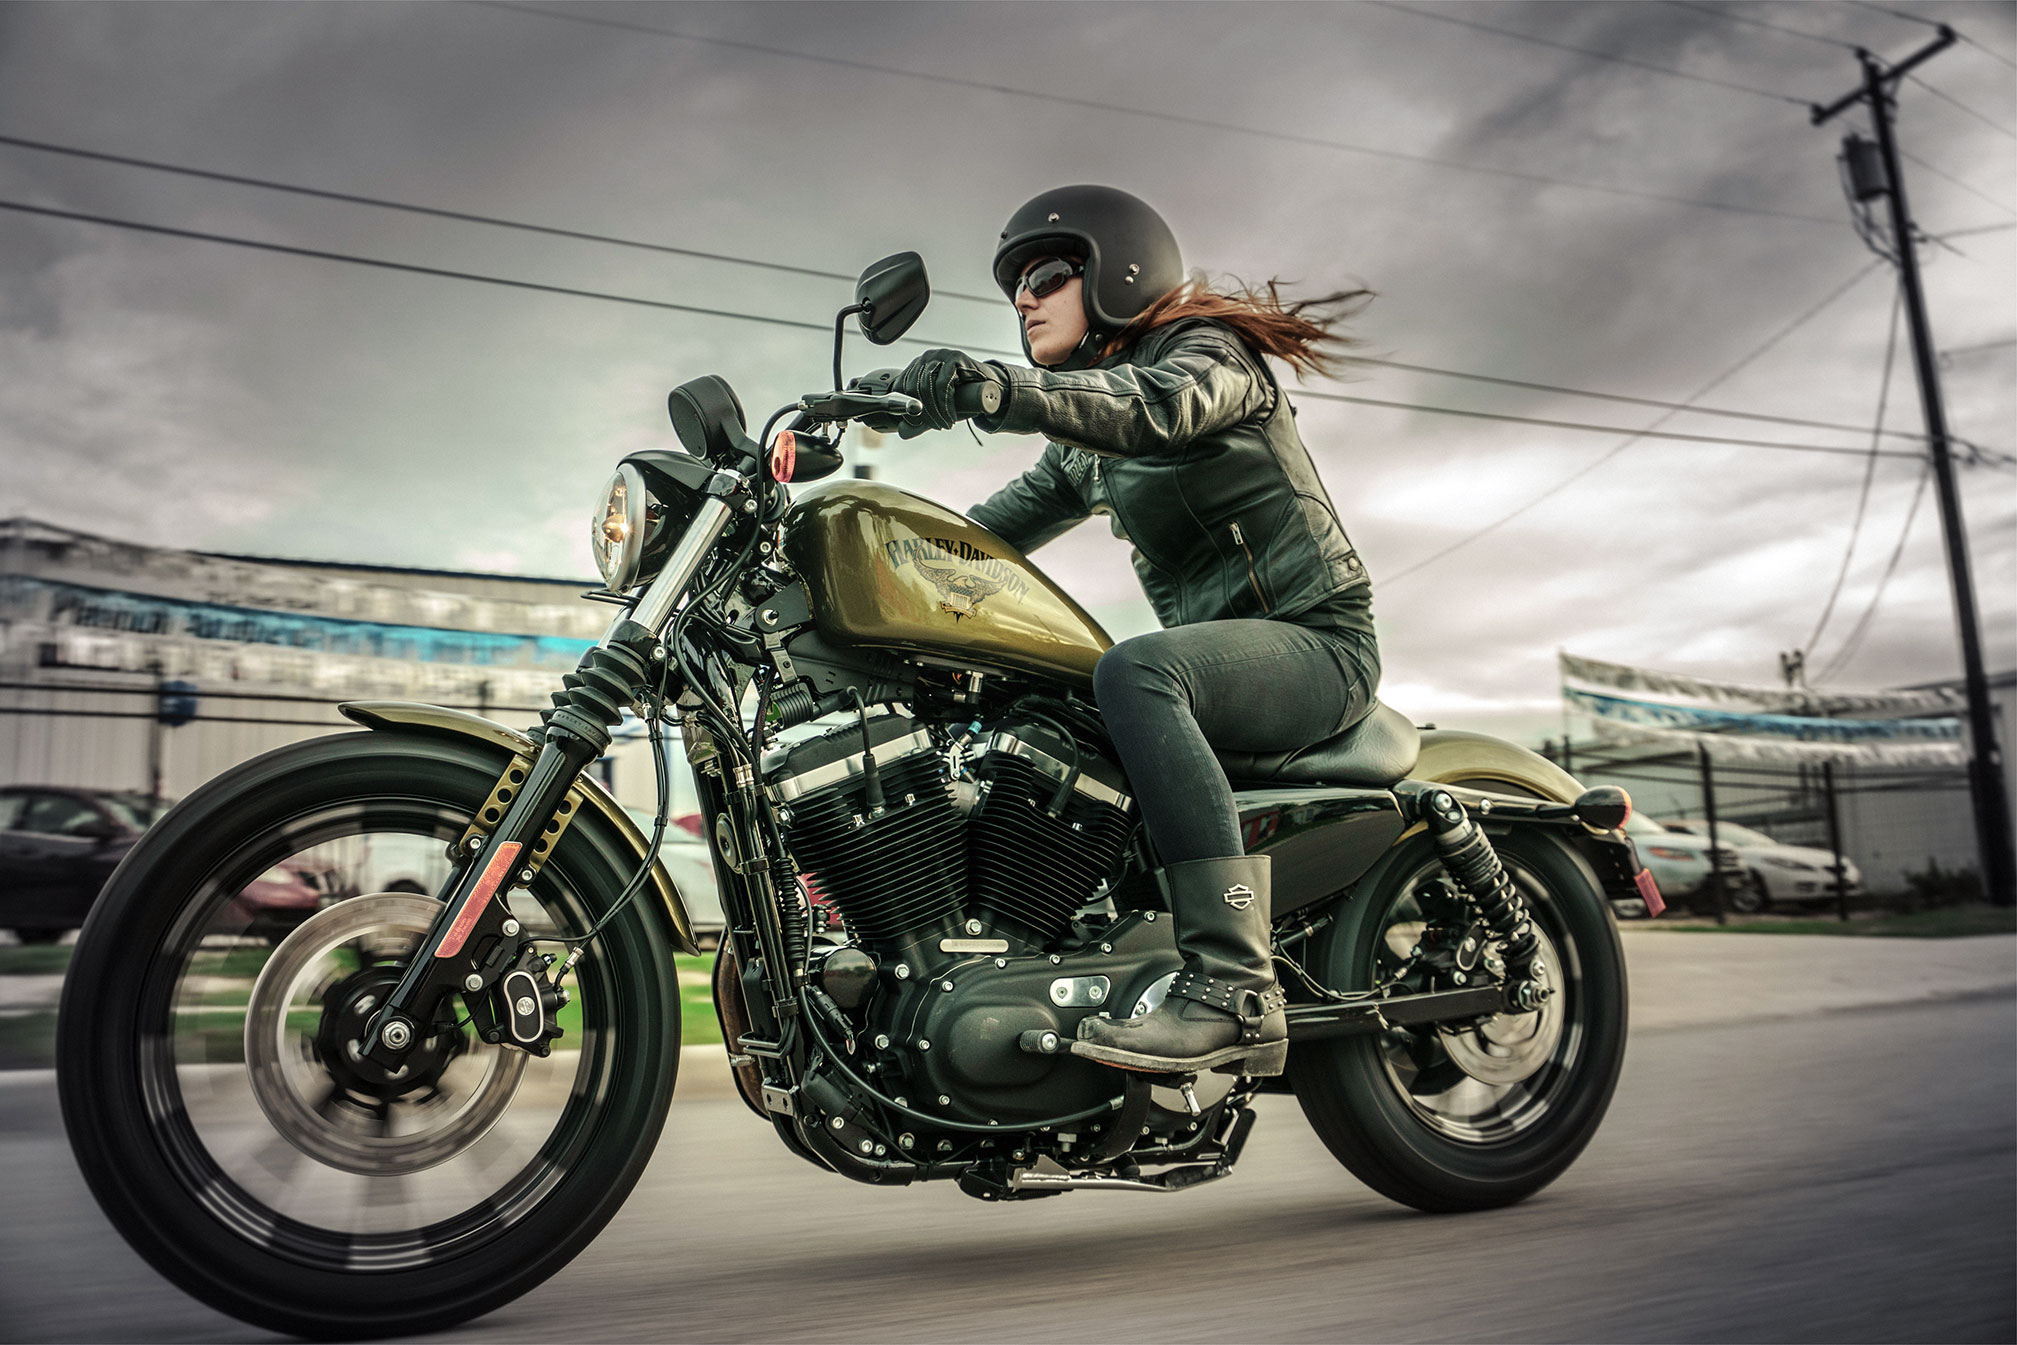 3 Harley Davidson Iron 883 HD Wallpapers